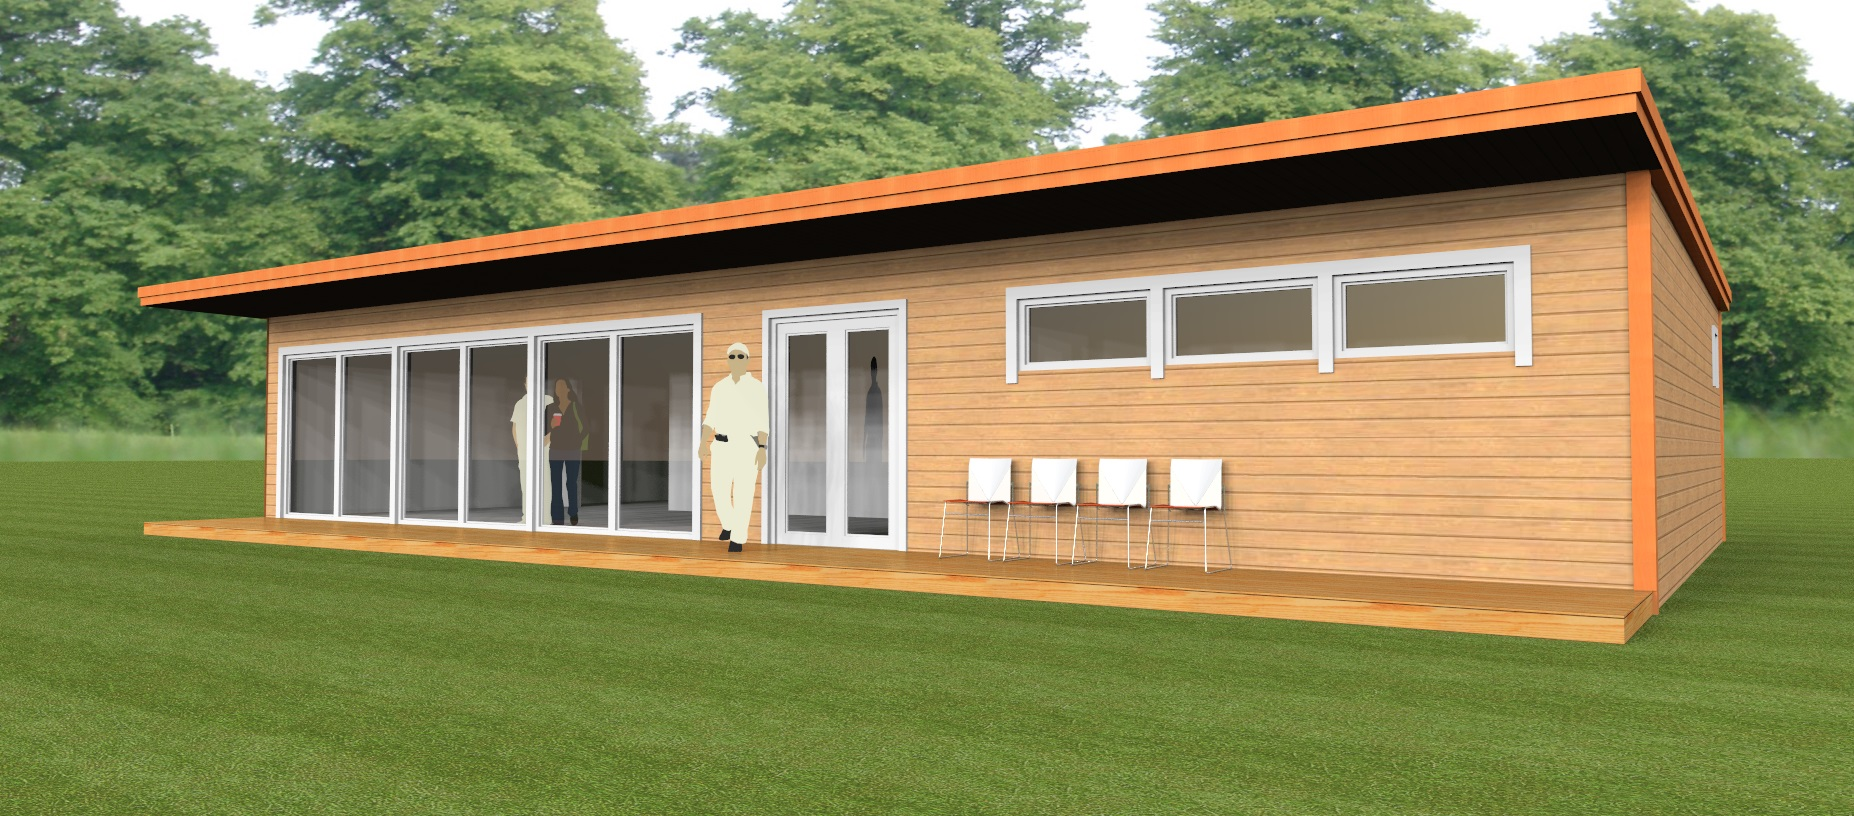 New Cricket Pavilion In London Underway Nordic Woodcouk